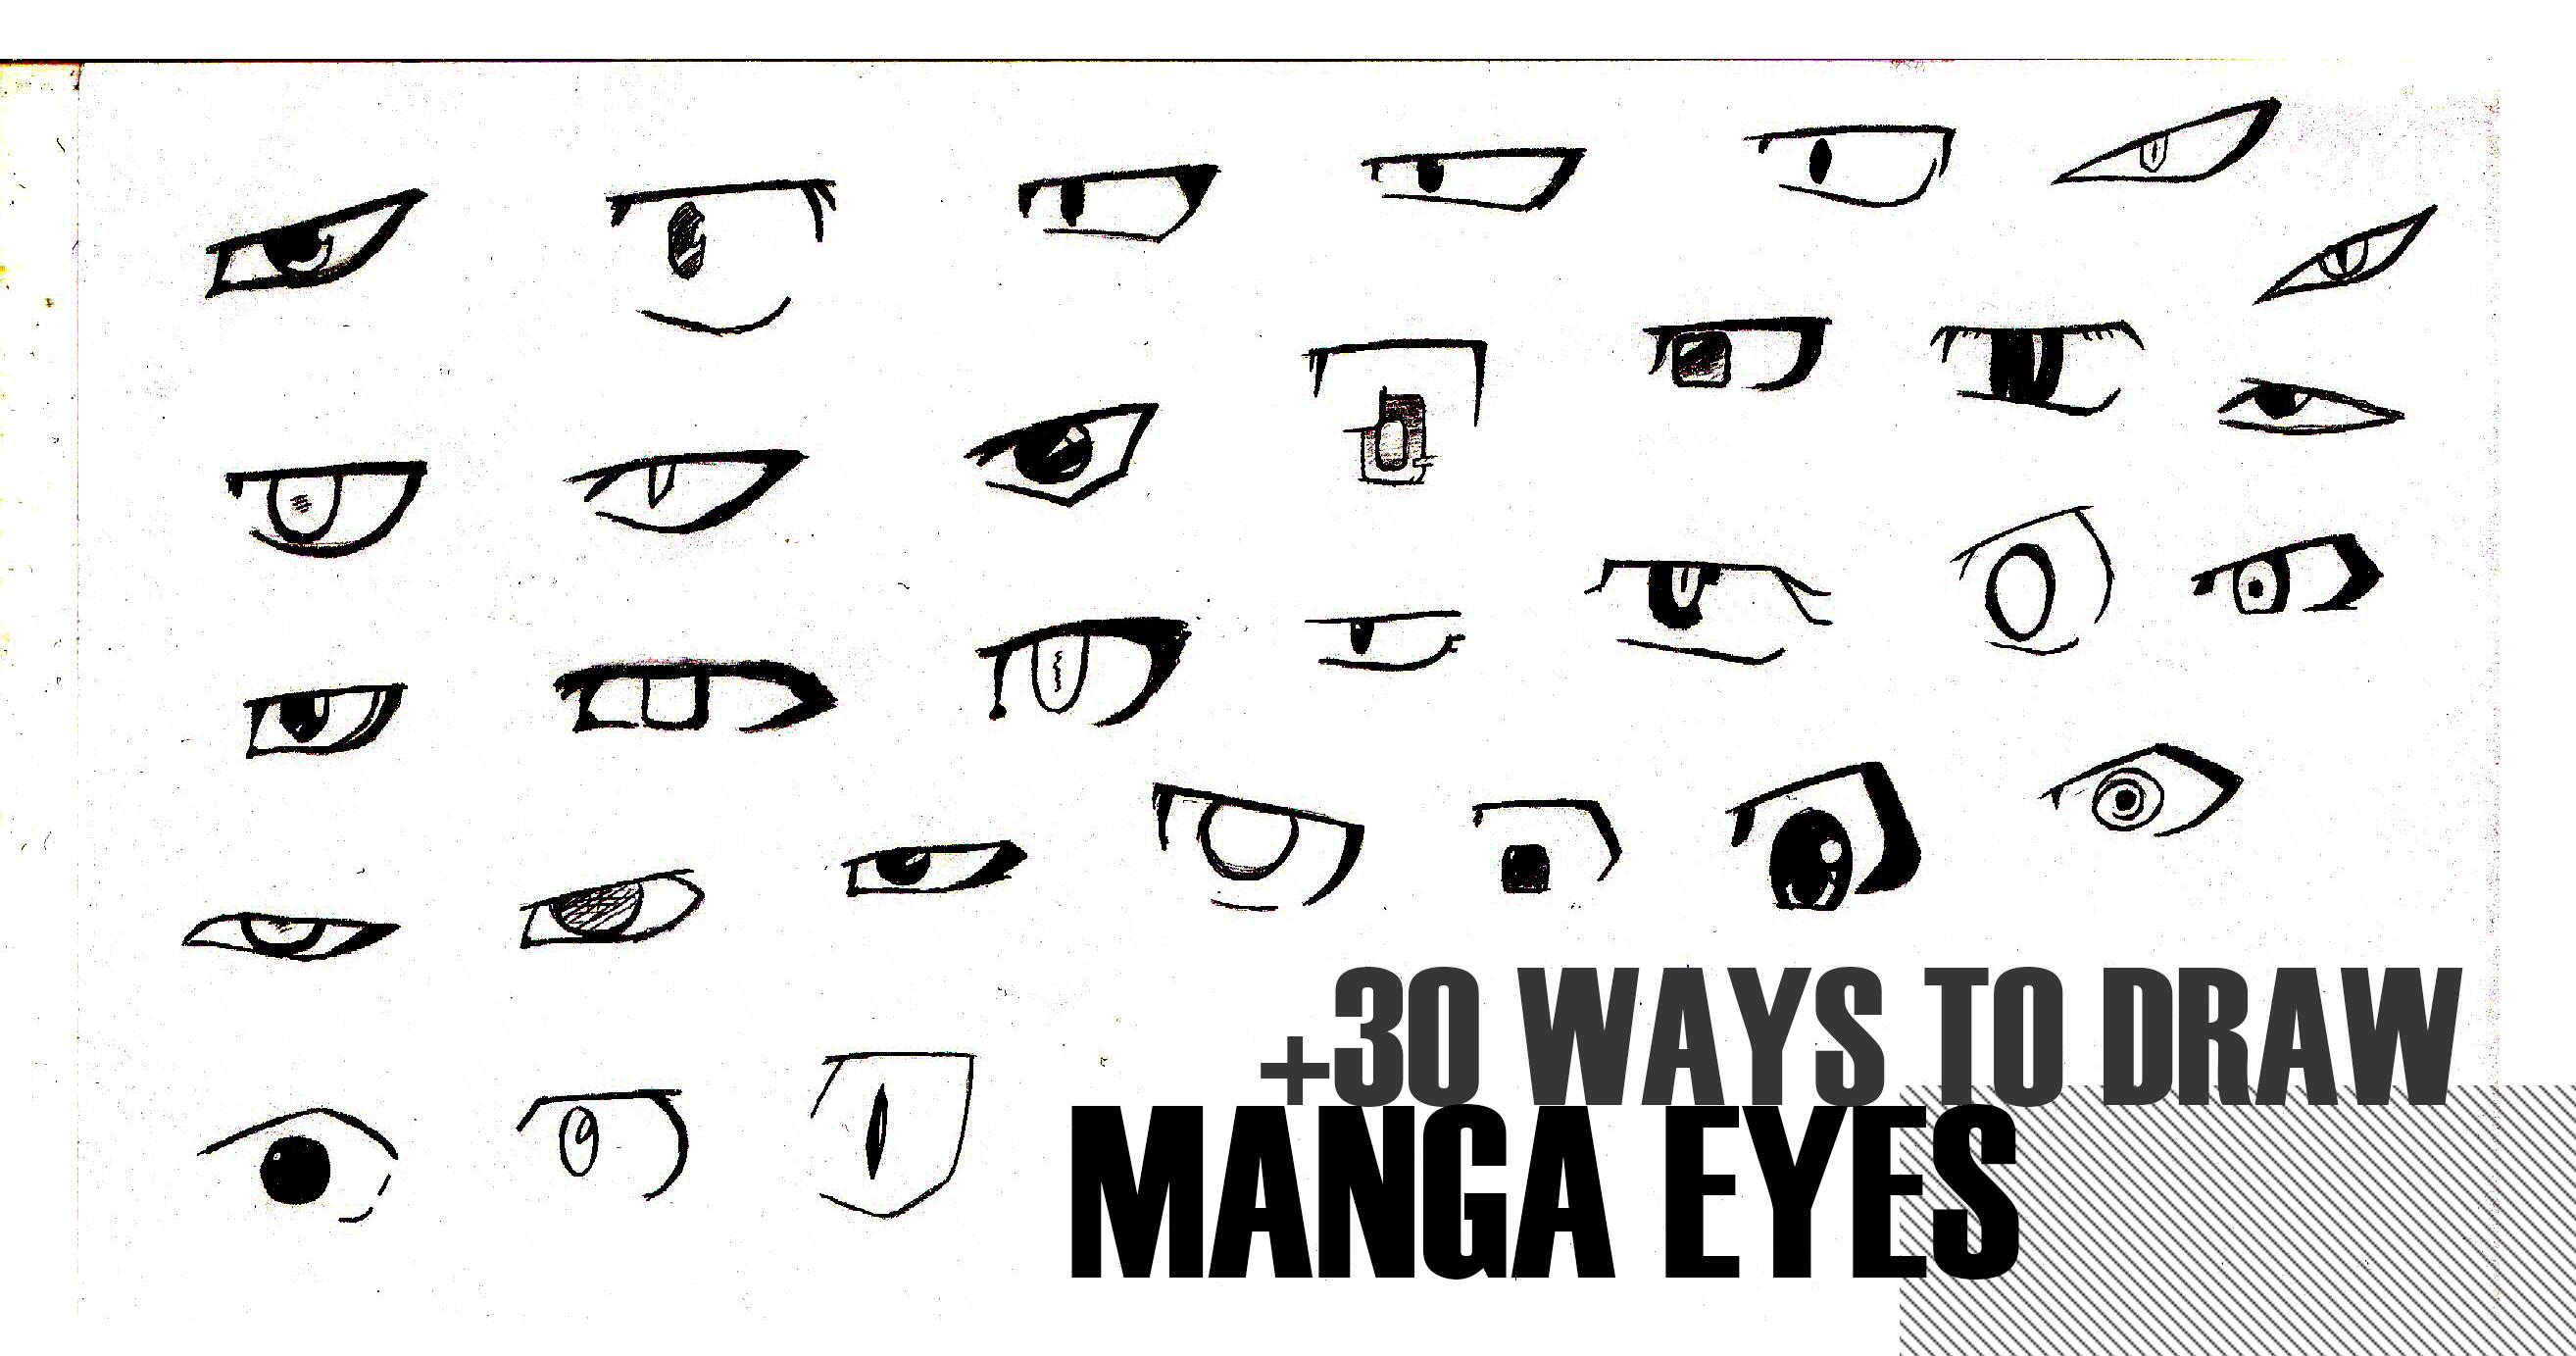 +30 Ways To Draw Manga Eyes By Mangakaofficial